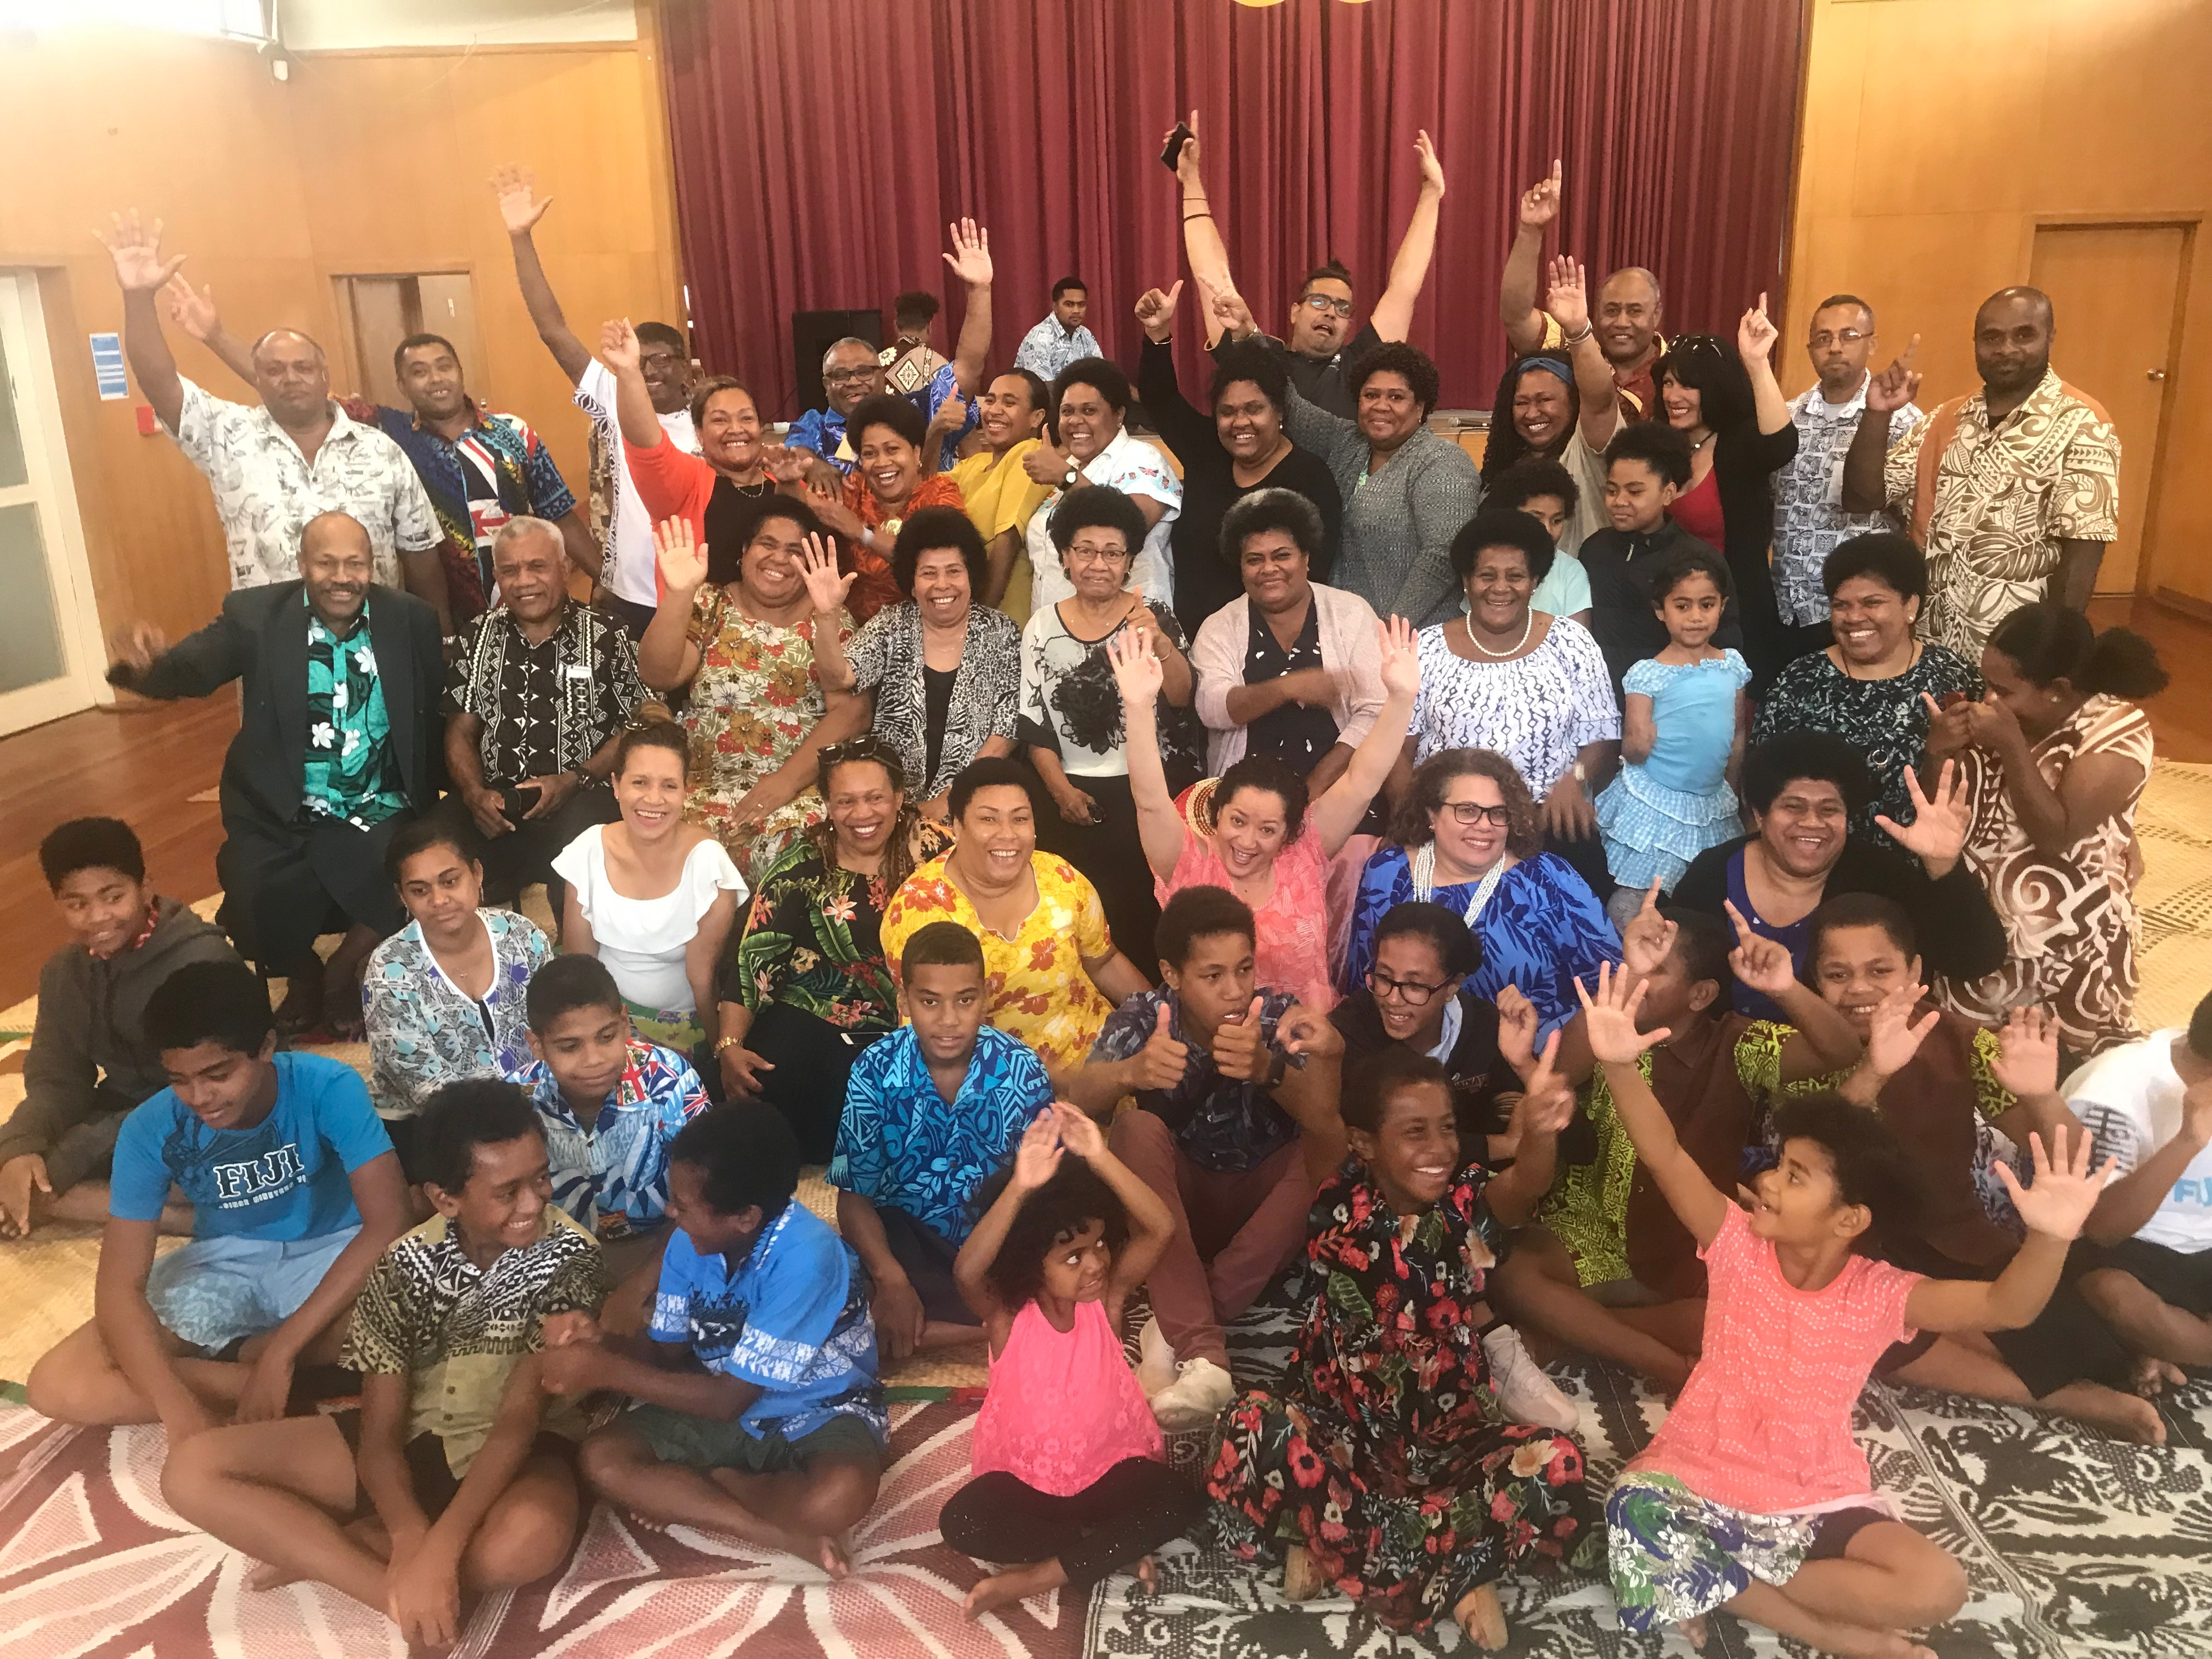 Members of the Hamilton Fijian community waiting for the Fiji Airways Fijian 7s team to arrive for the traditional welcome ceremony on January 21, 2019. Photo: Nemani Delaibatiki